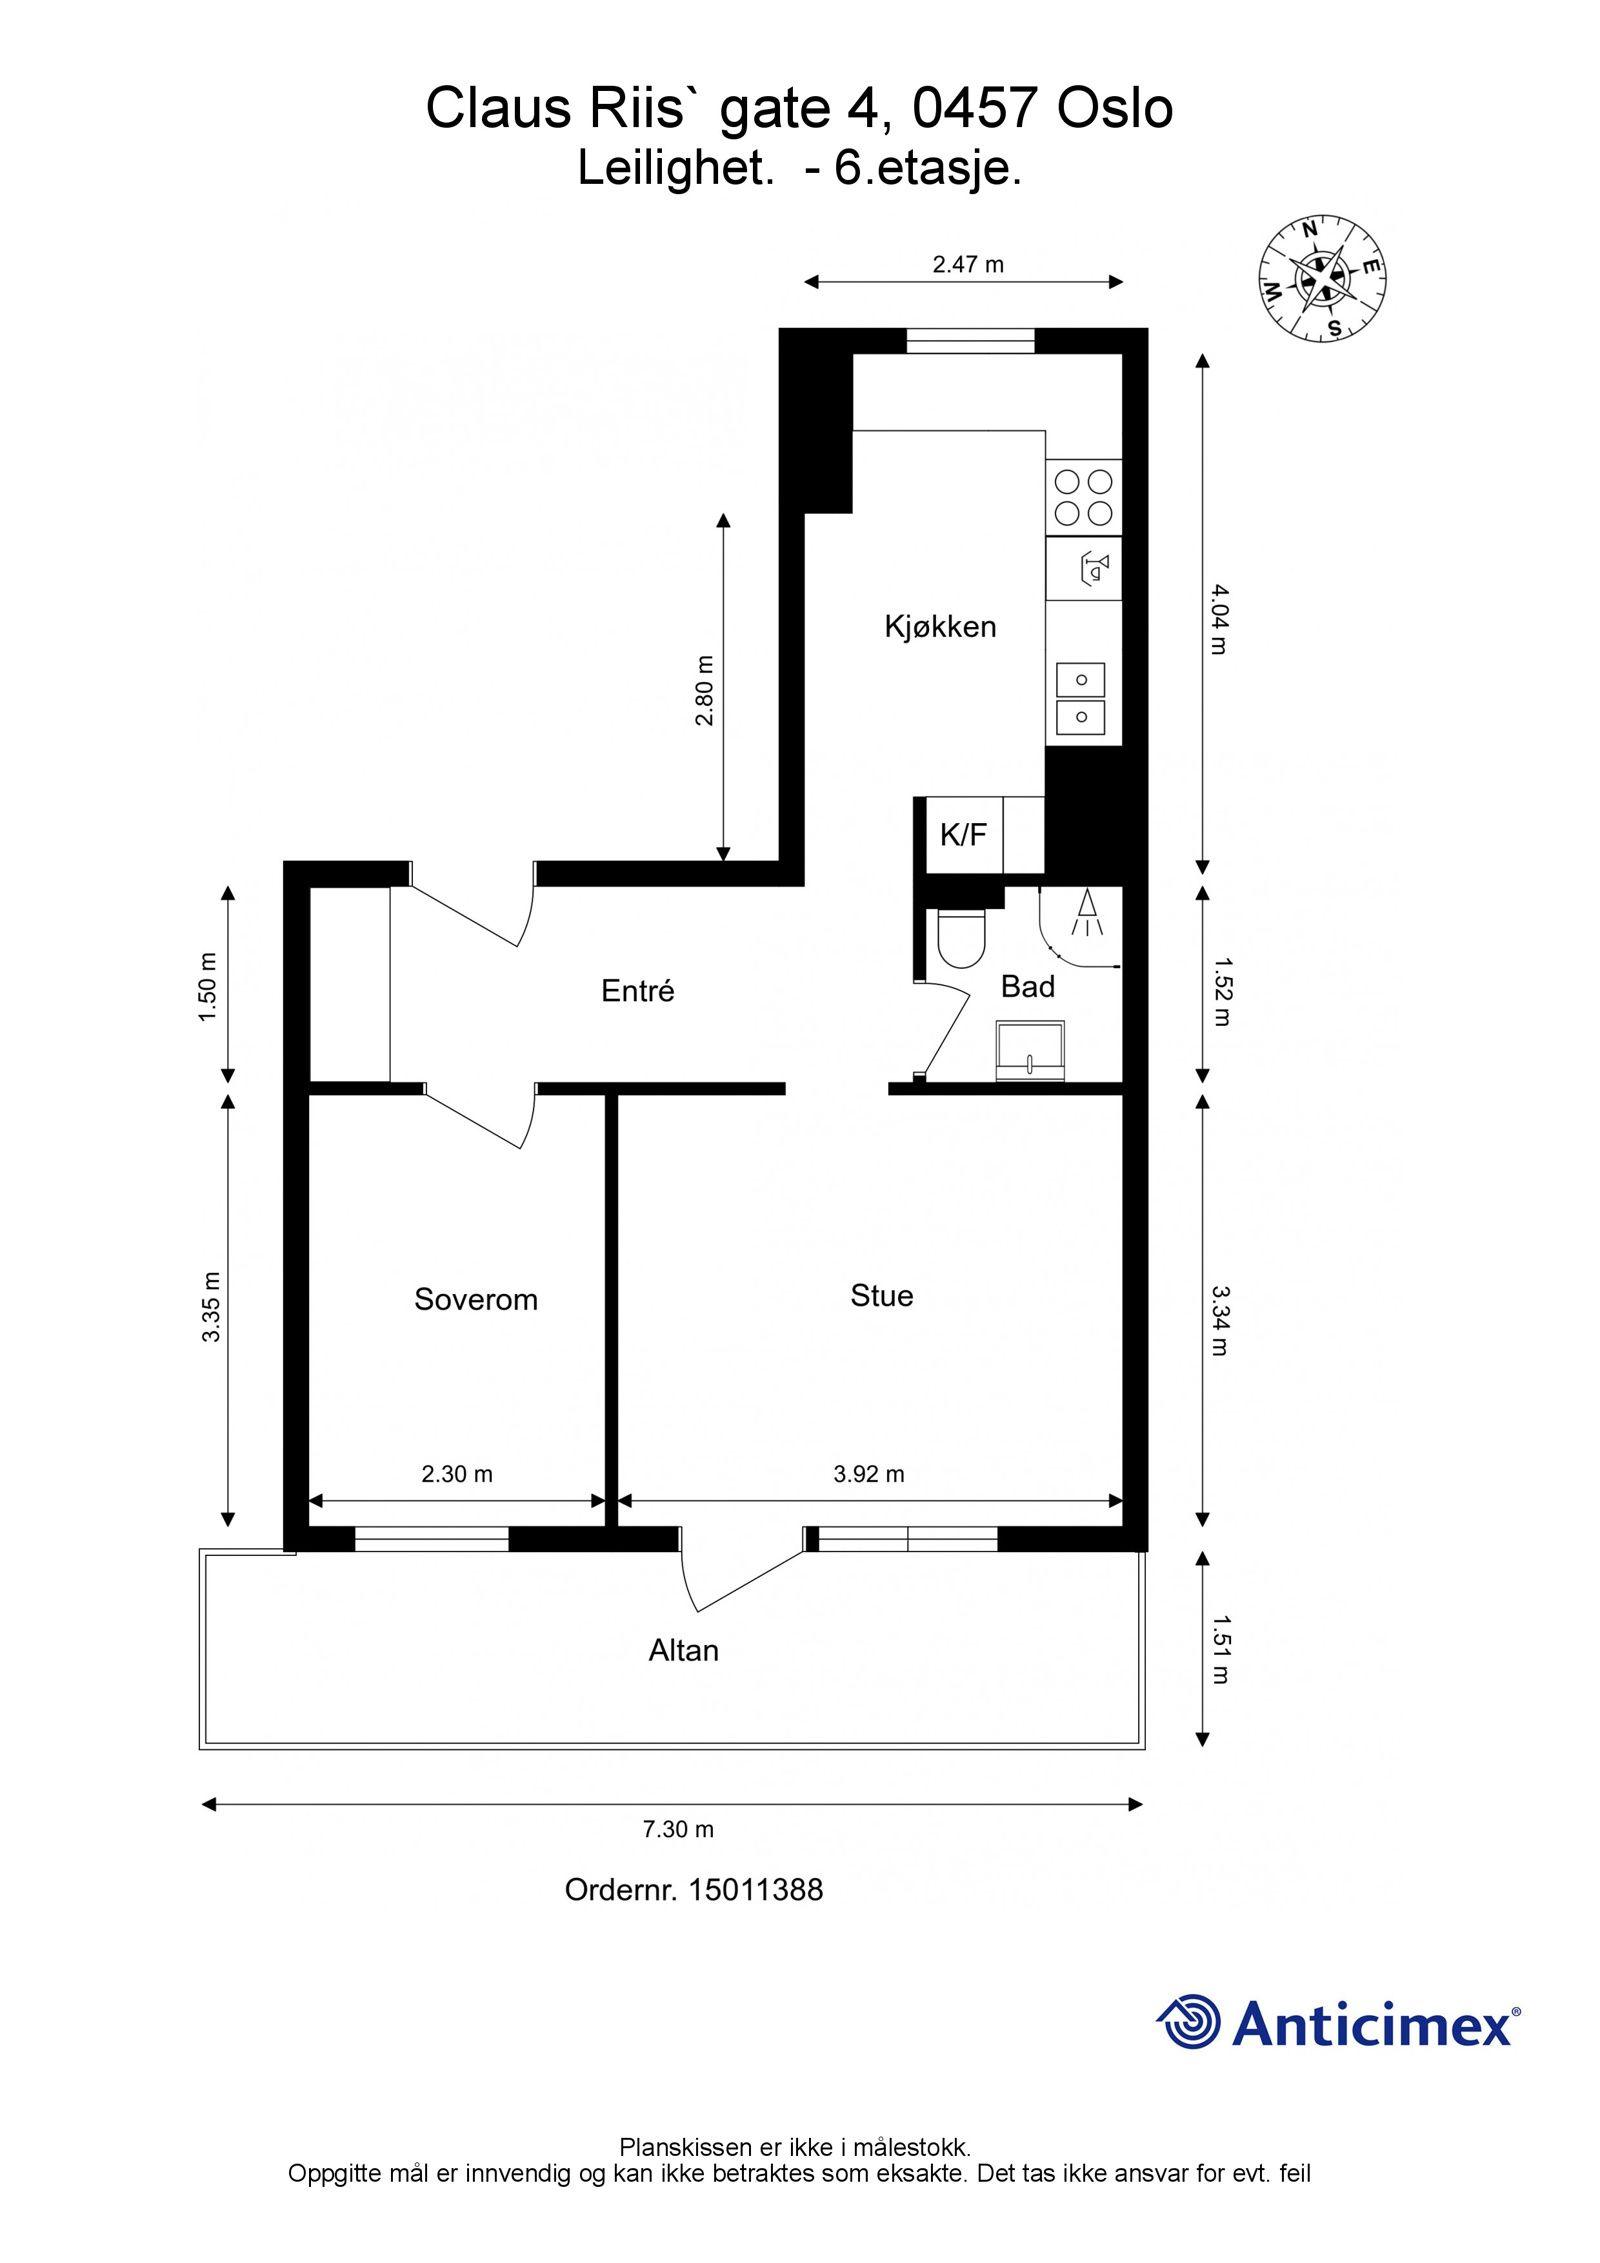 Claus Riis` gate 4 Plantegning. I tillegg disponeres en kjellerbod på ca. 4,8m², samt en loftsbod med gulvareal på ca. 8,8m². Heis i bygget.